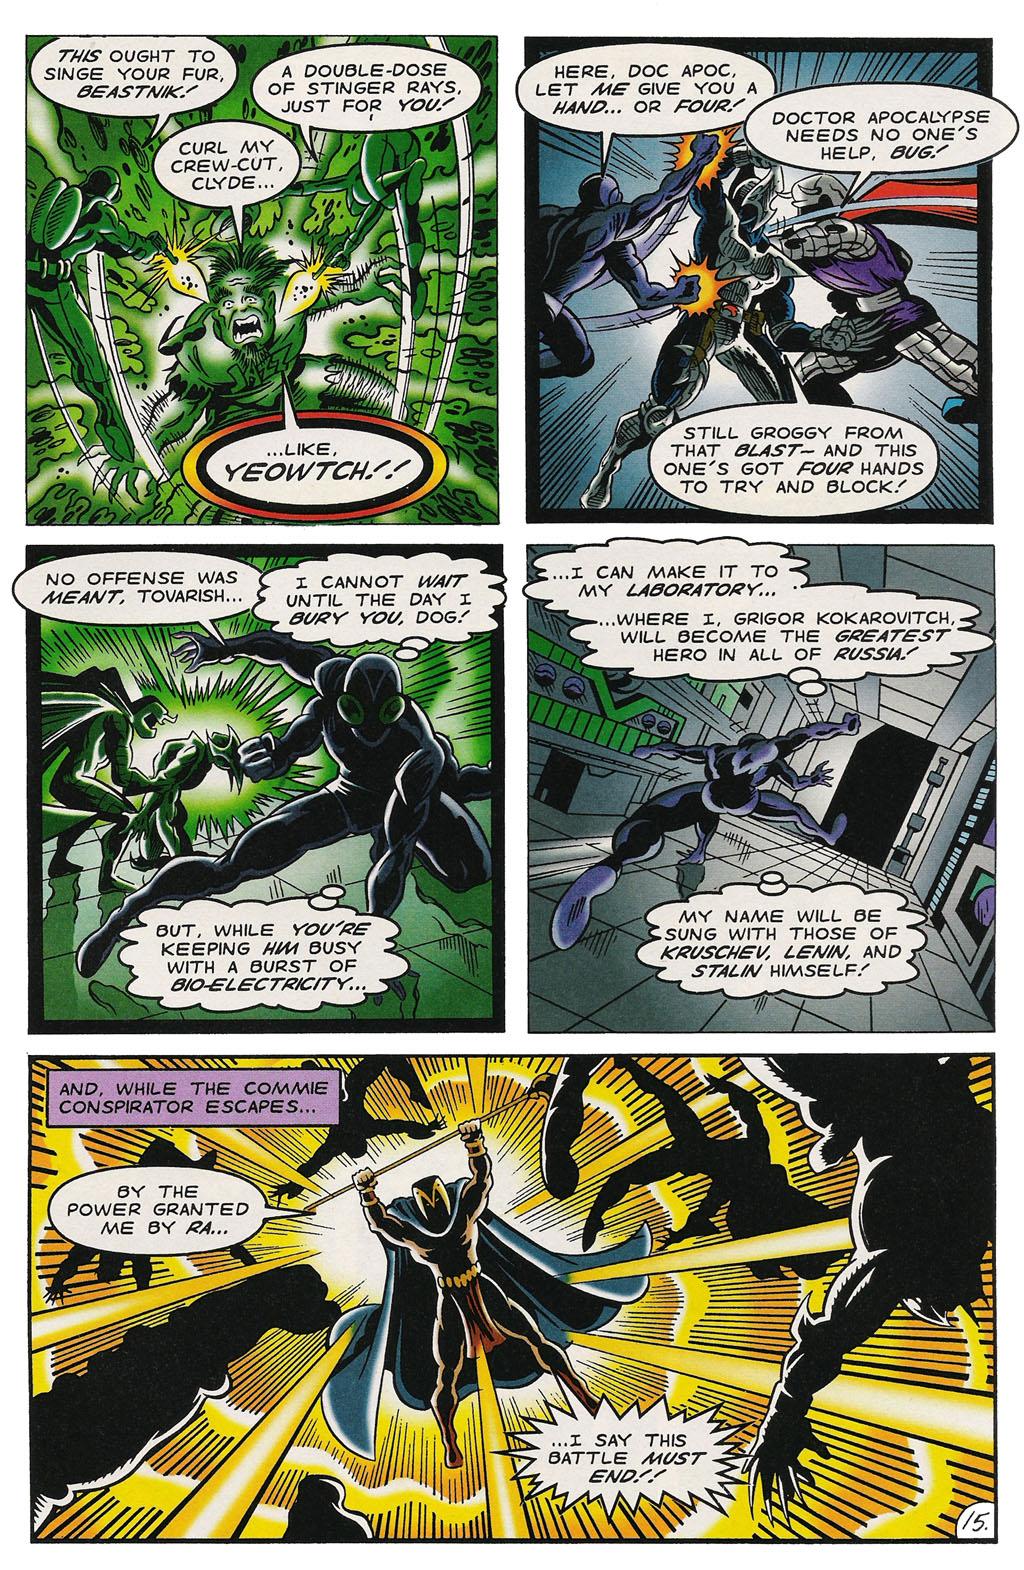 Read online ShadowHawk comic -  Issue #14 - 19